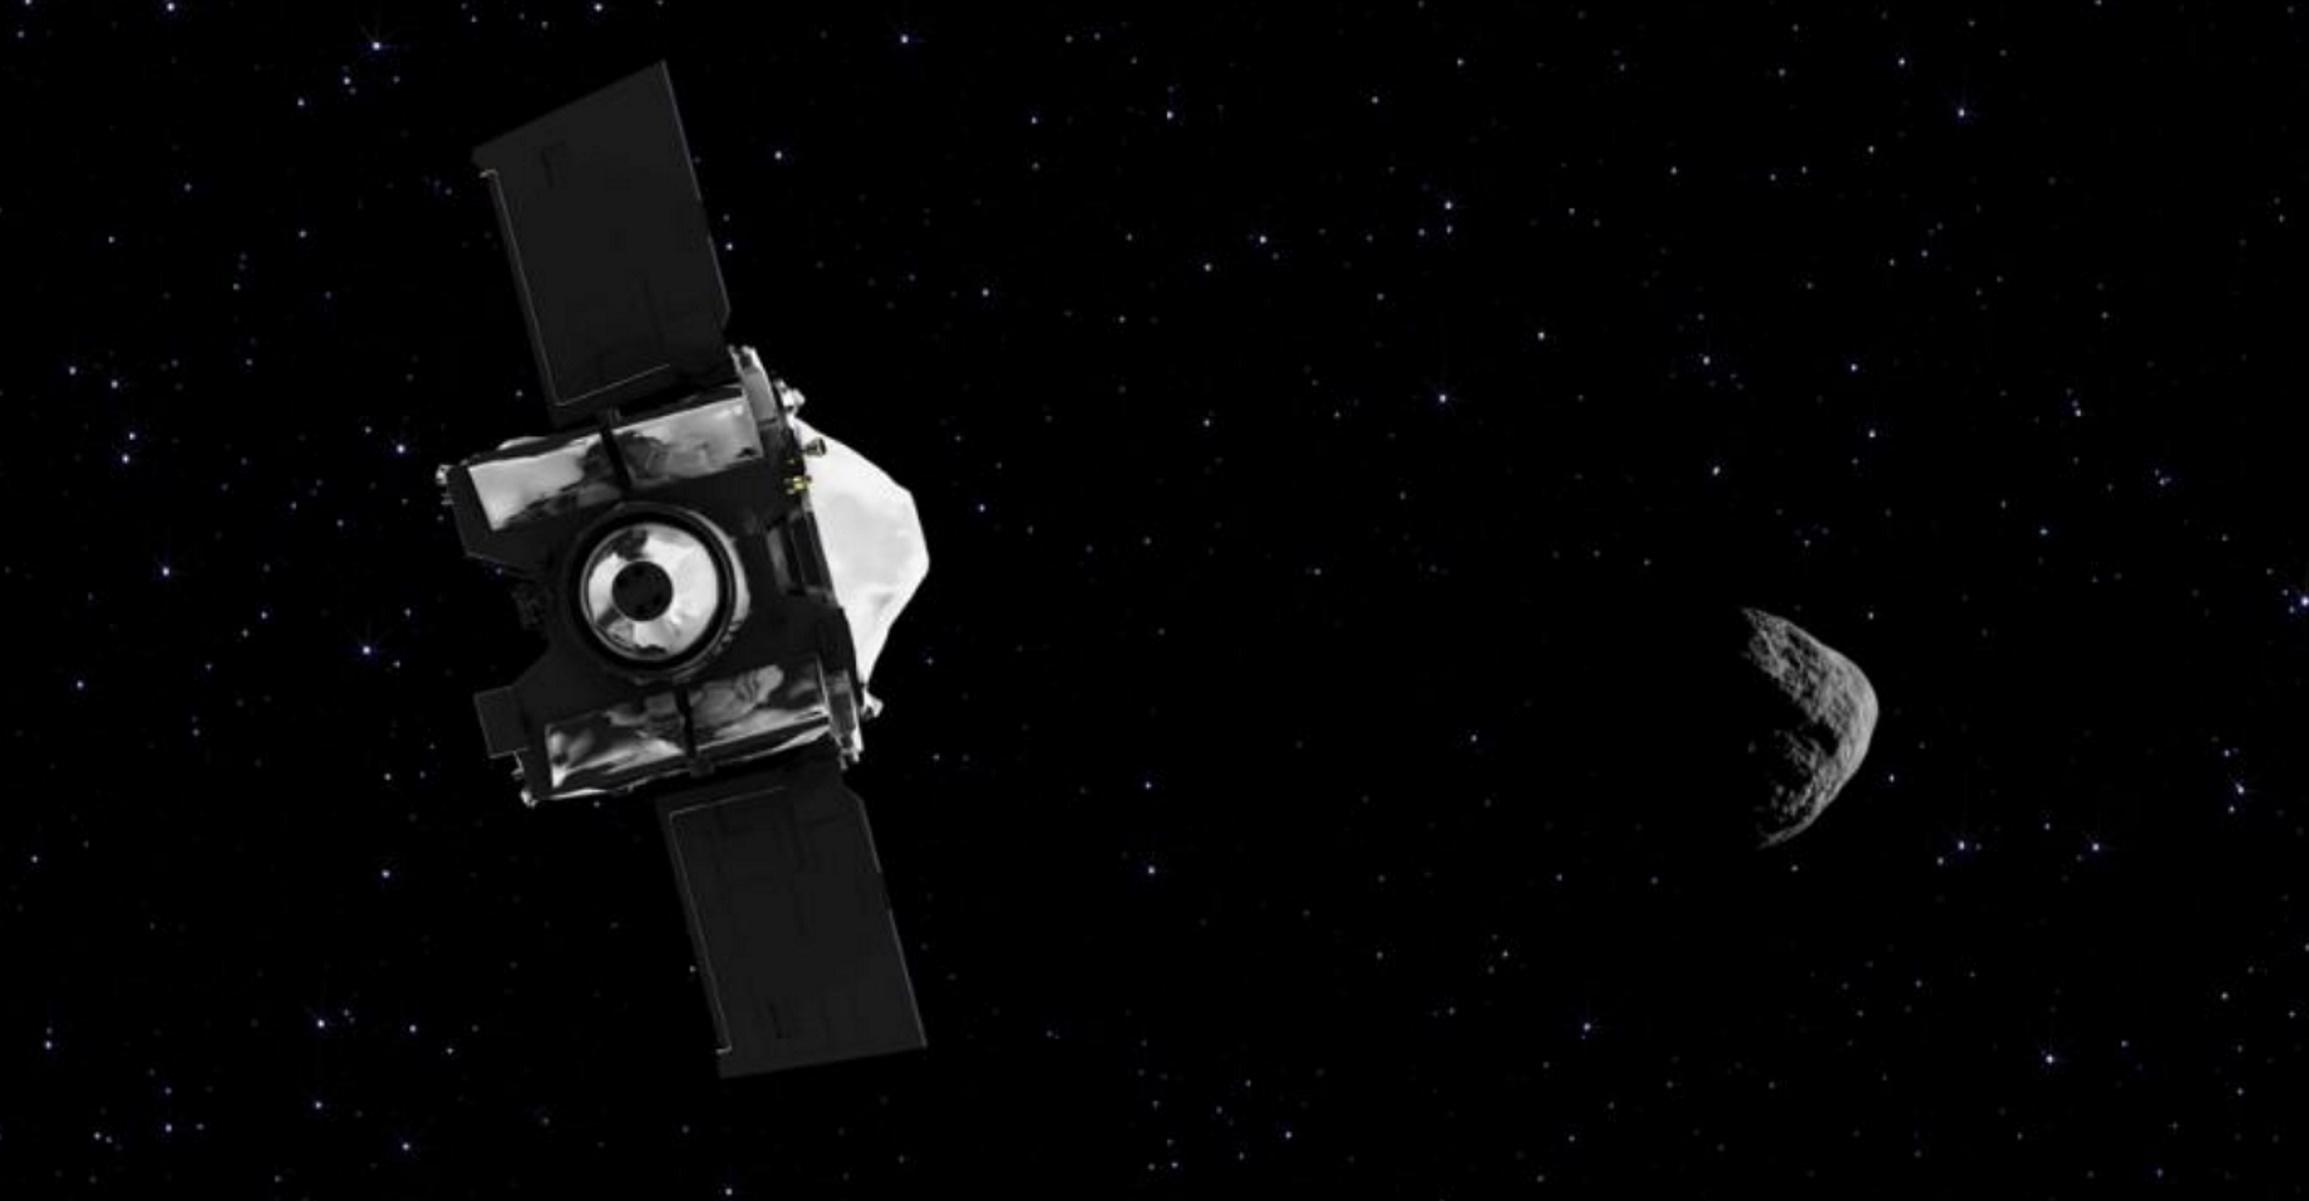 NASA: Αστεροειδής όσο το Άγαλμα της Ελευθερίας περνά ξυστά από τη Γη